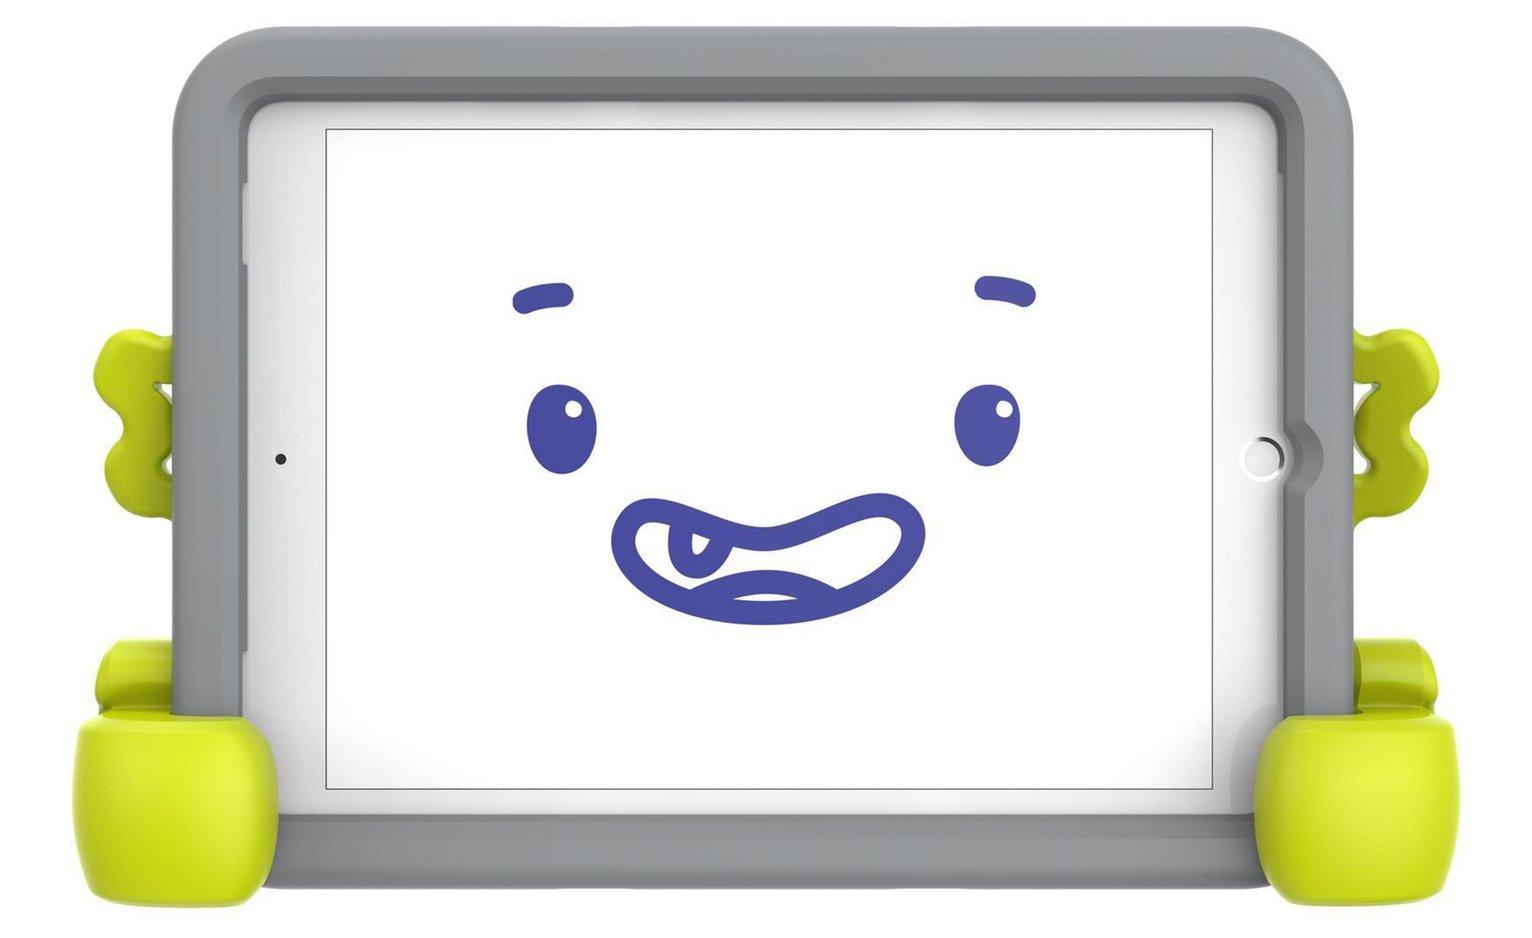 Speck Case-E 9.7 Inch iPad Kids Tablet Case - Grey/Green